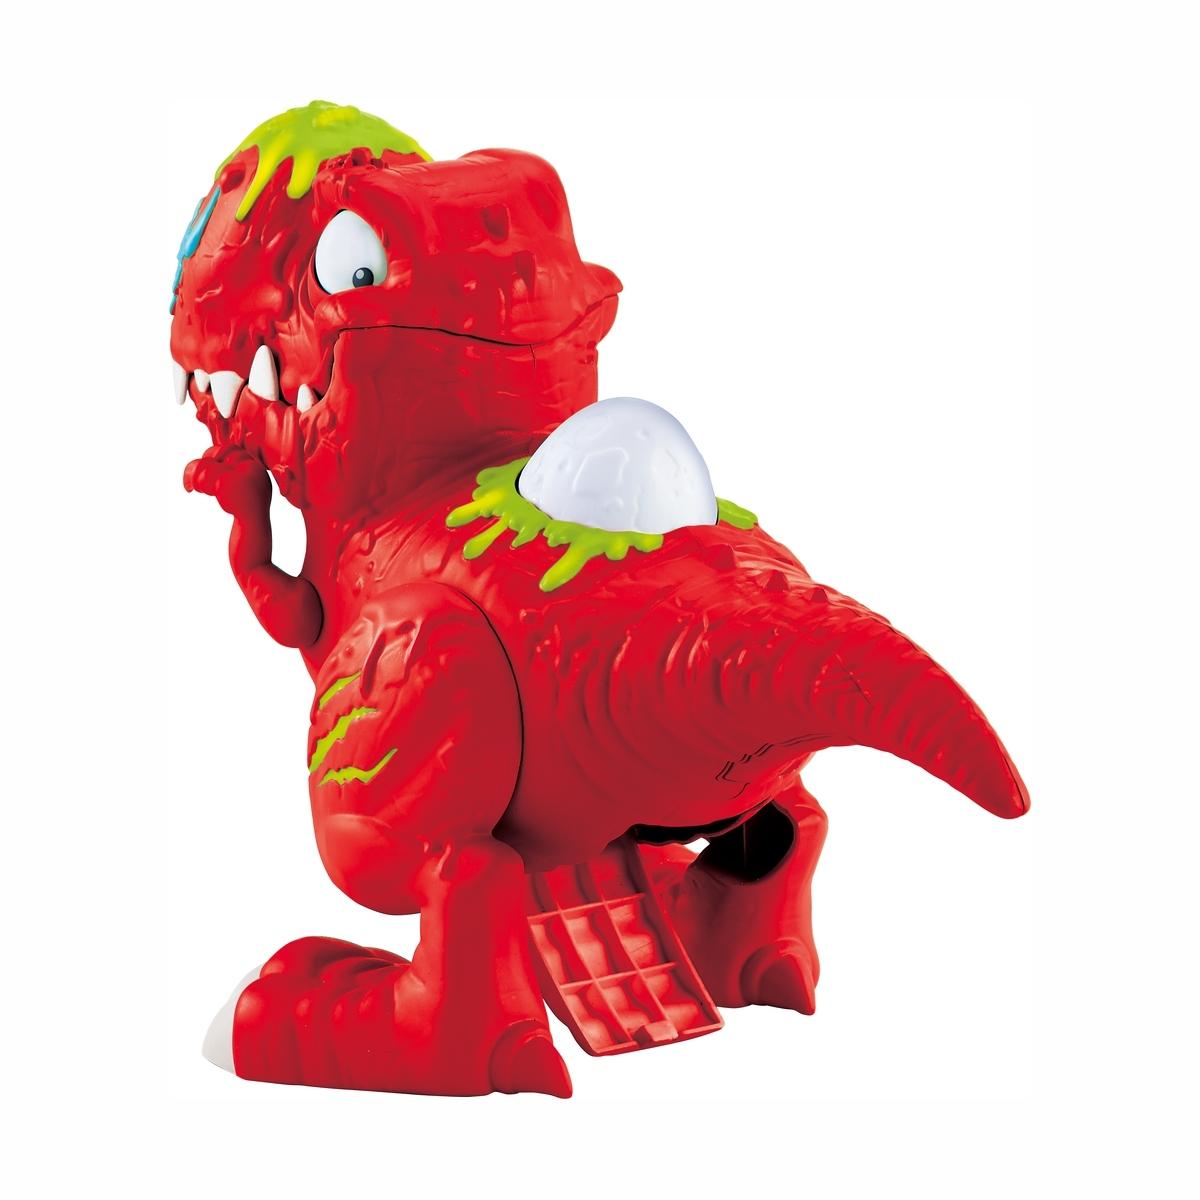 Zuru Smashers Series 3 Dino Smash Rex Playset | Kmart